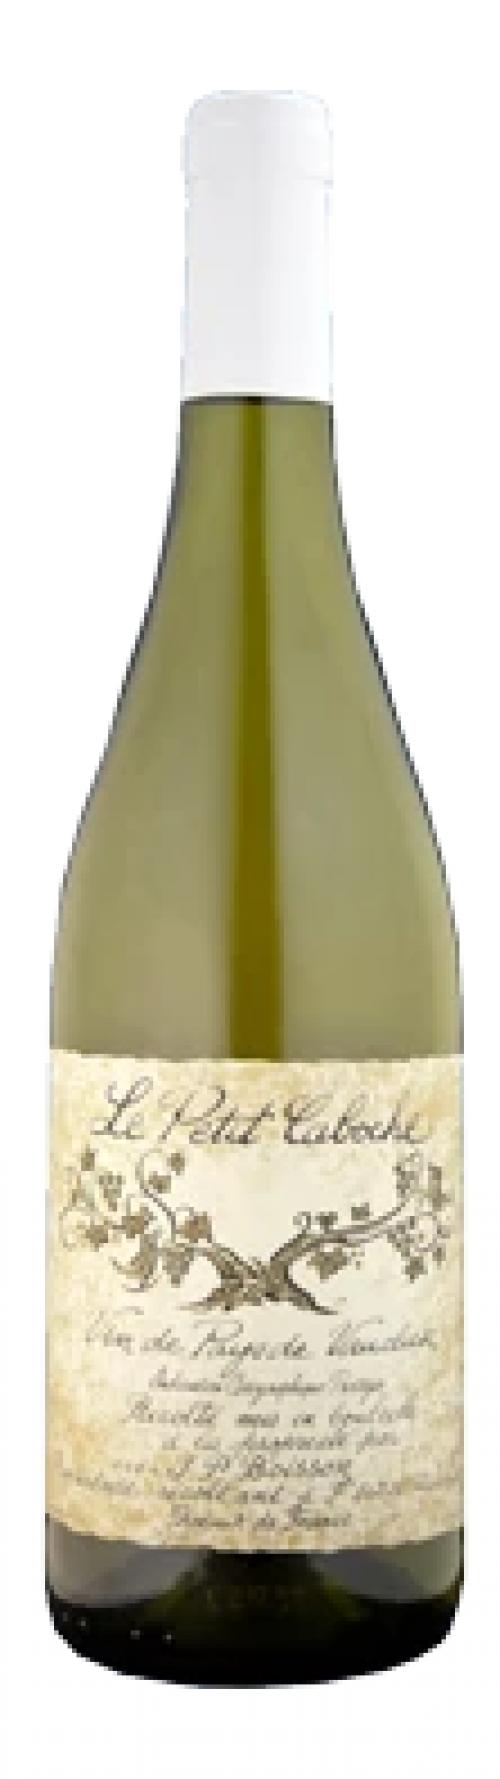 Caboche Vaucluse White 750ml